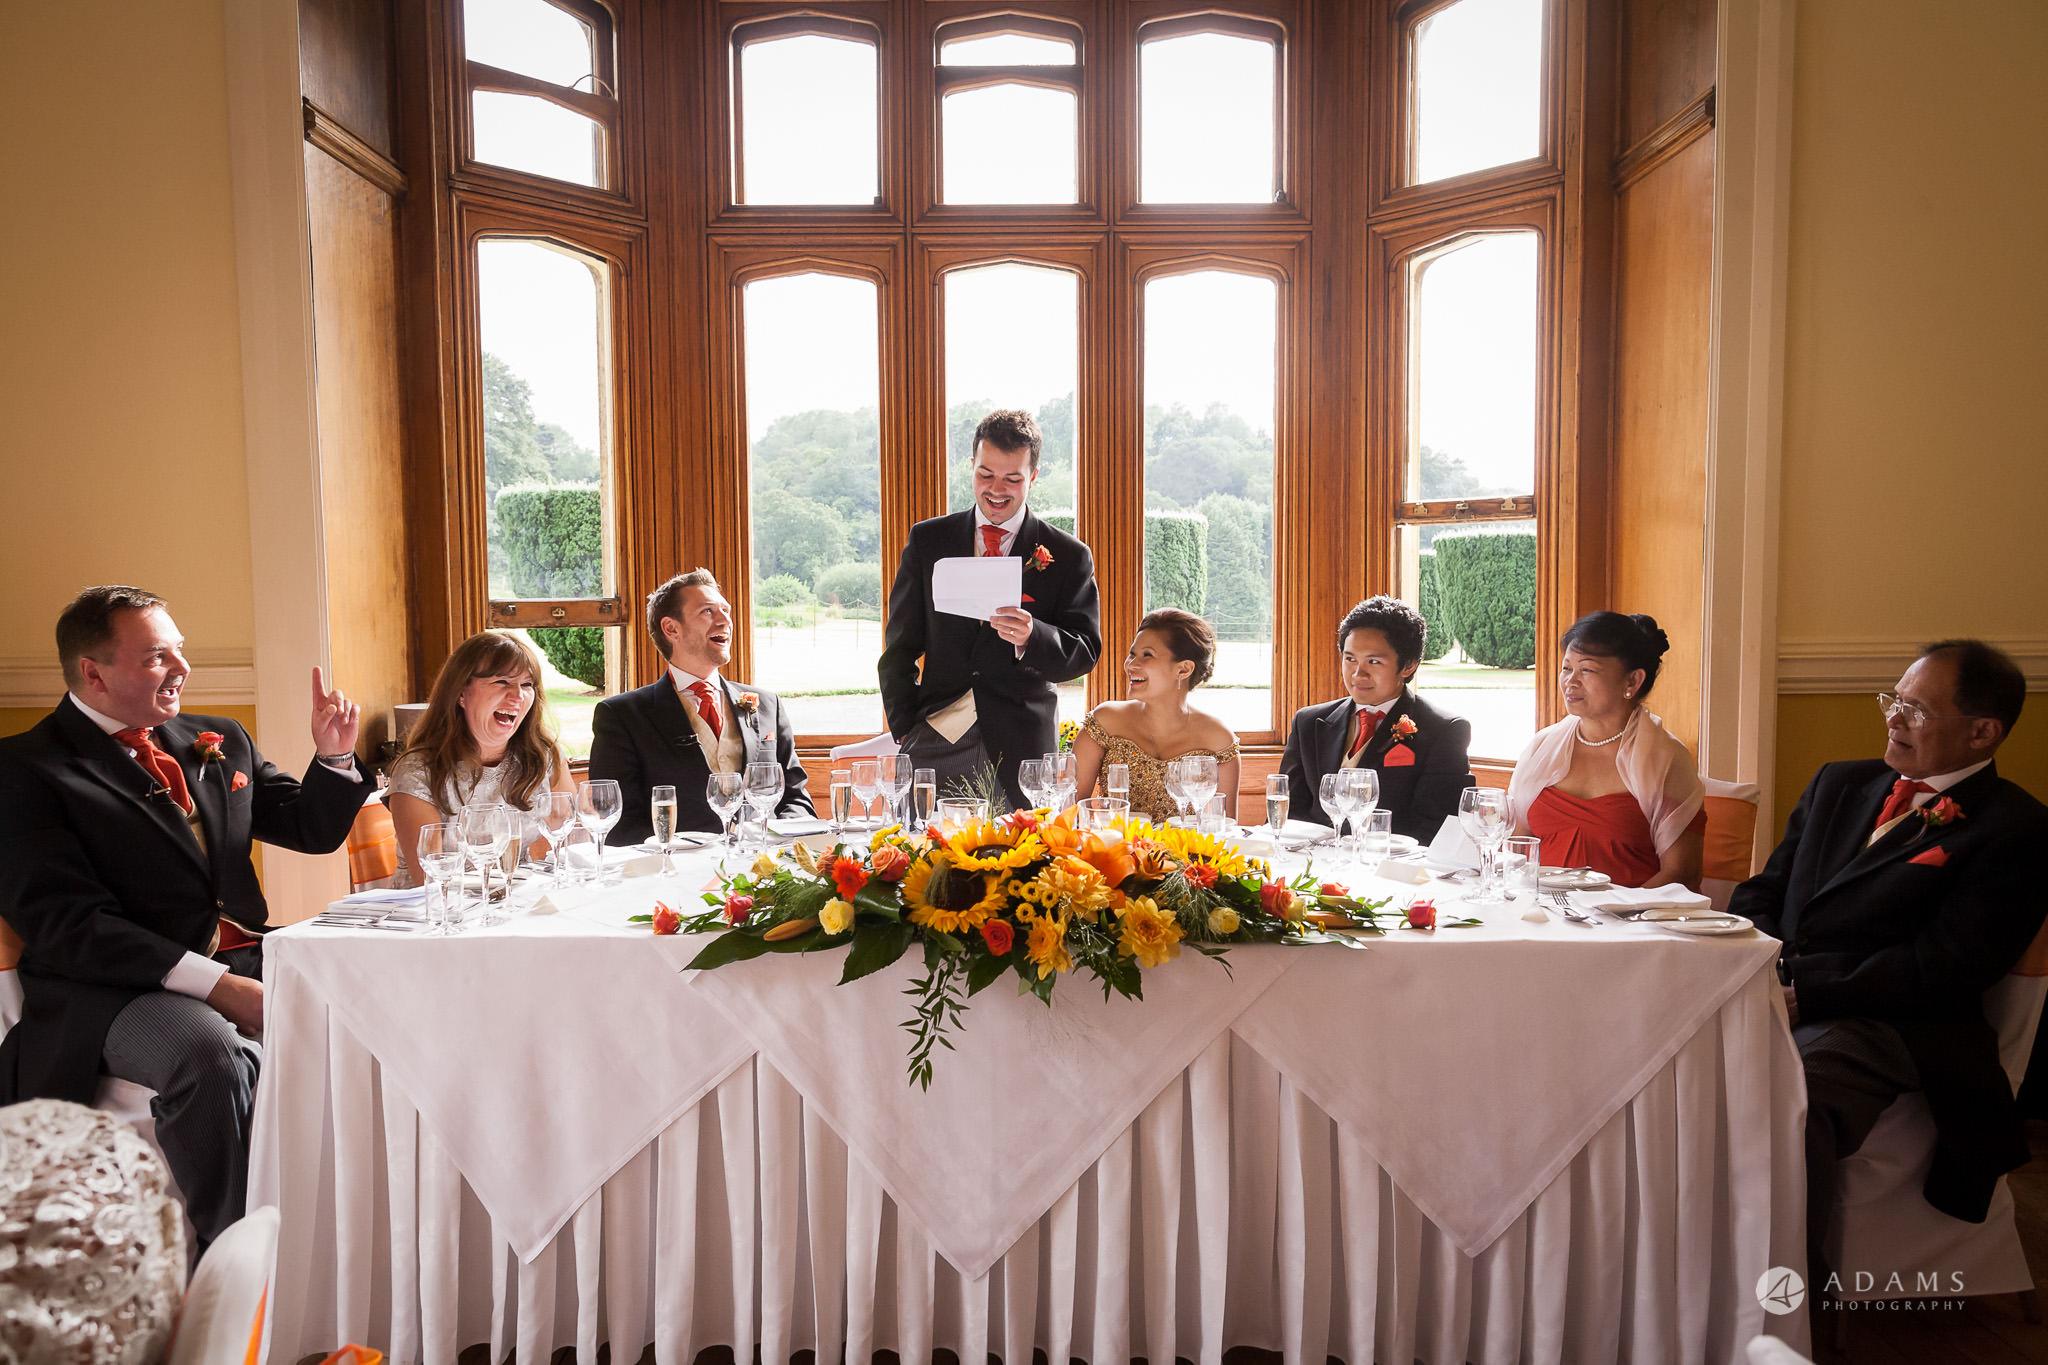 St Audries Park wedding groom speech